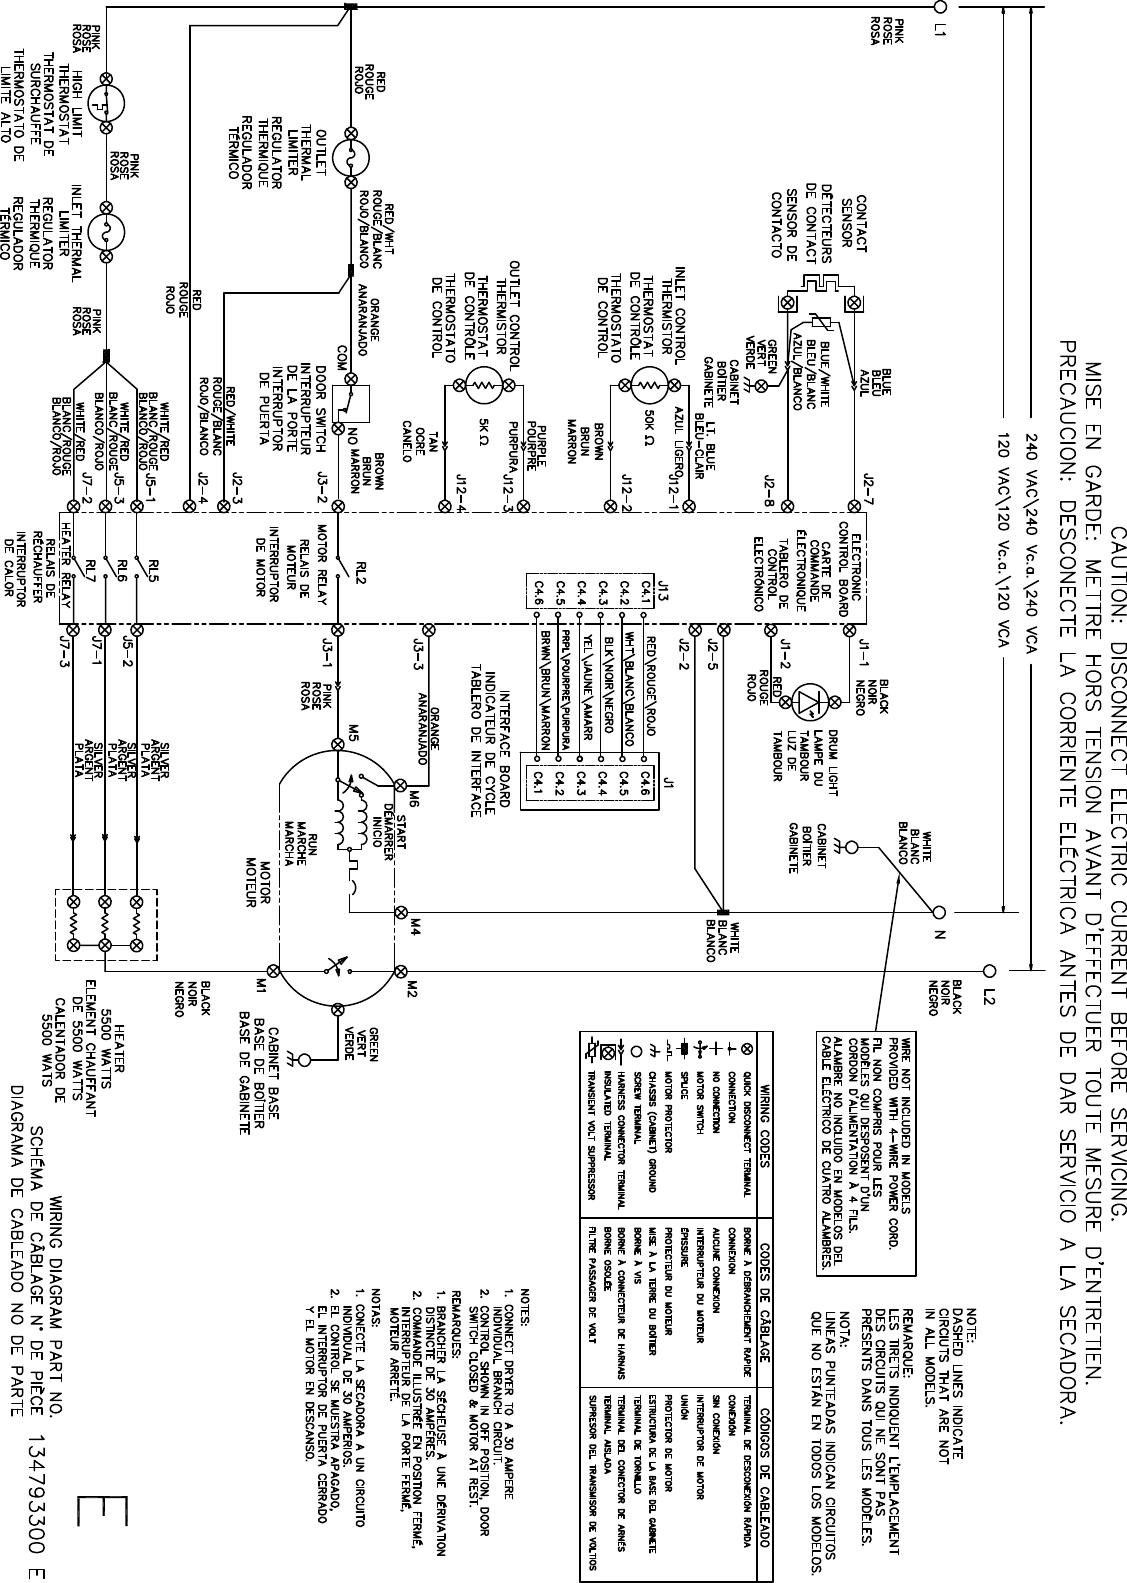 american ironhorse chopper wiring diagram